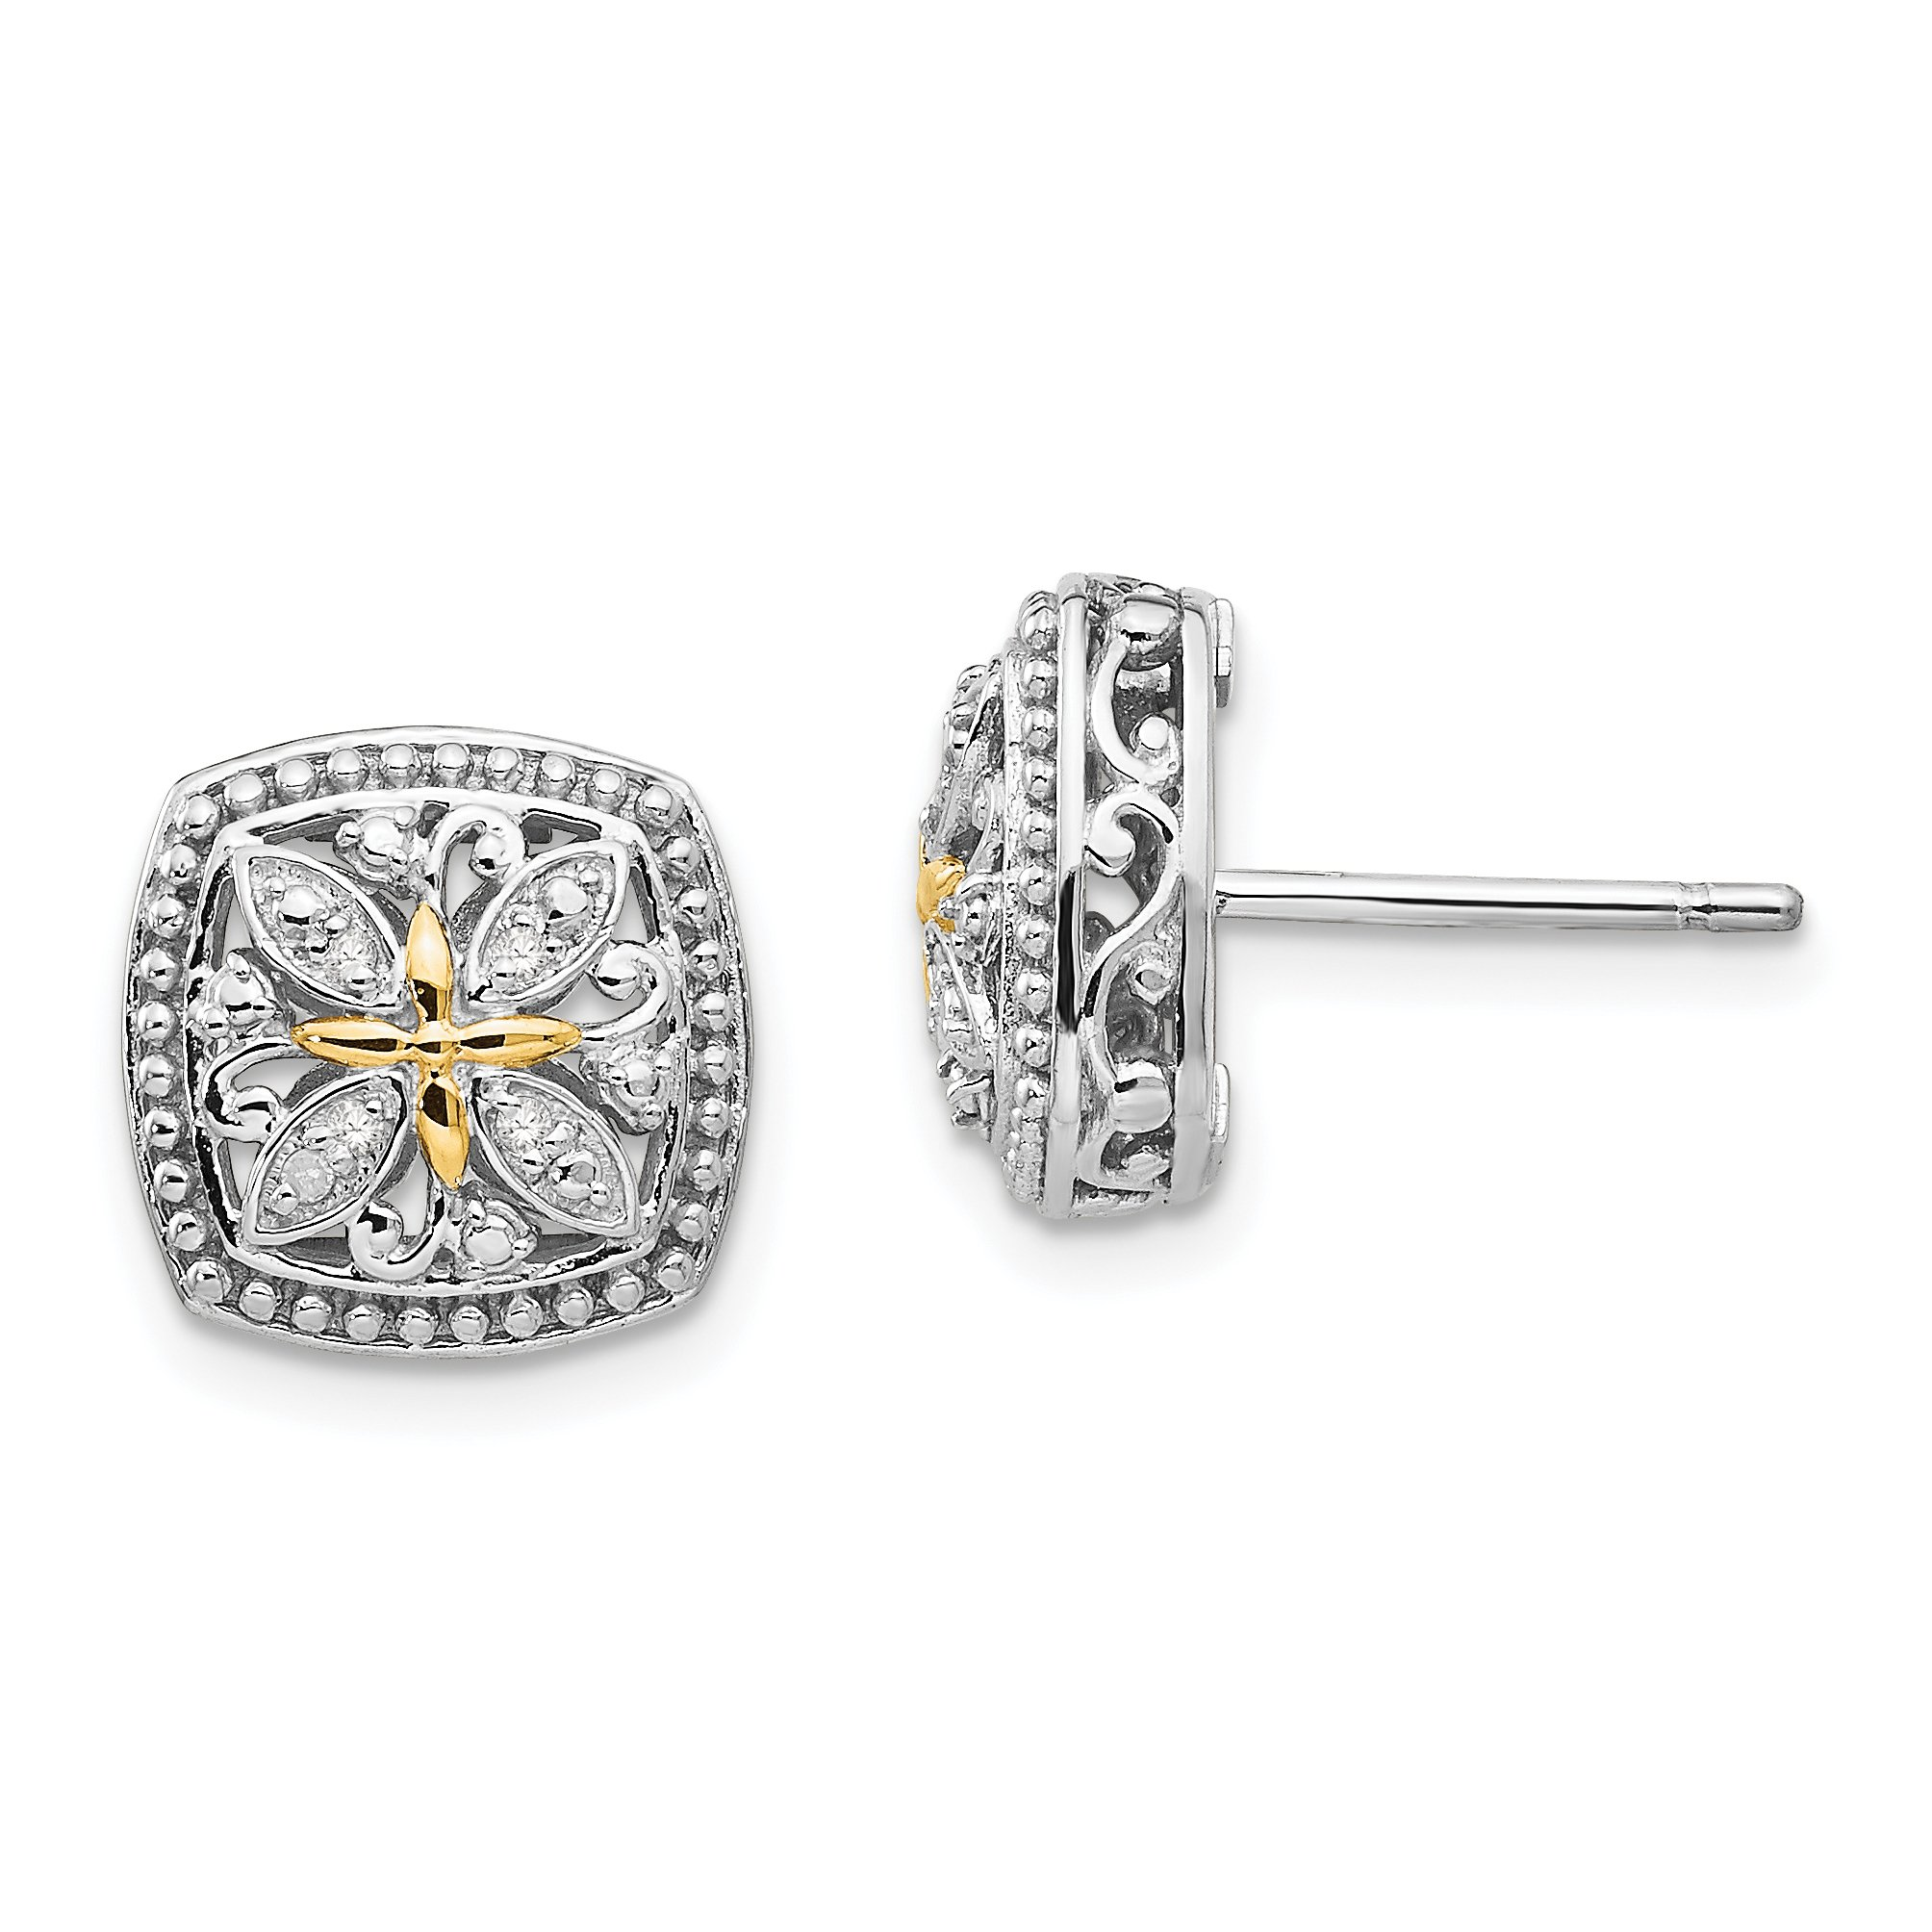 ICE CARATS 925 Sterling Silver 14k Diamond Post Stud Ball Button Earrings Fine Jewelry Gift Set For Women Heart